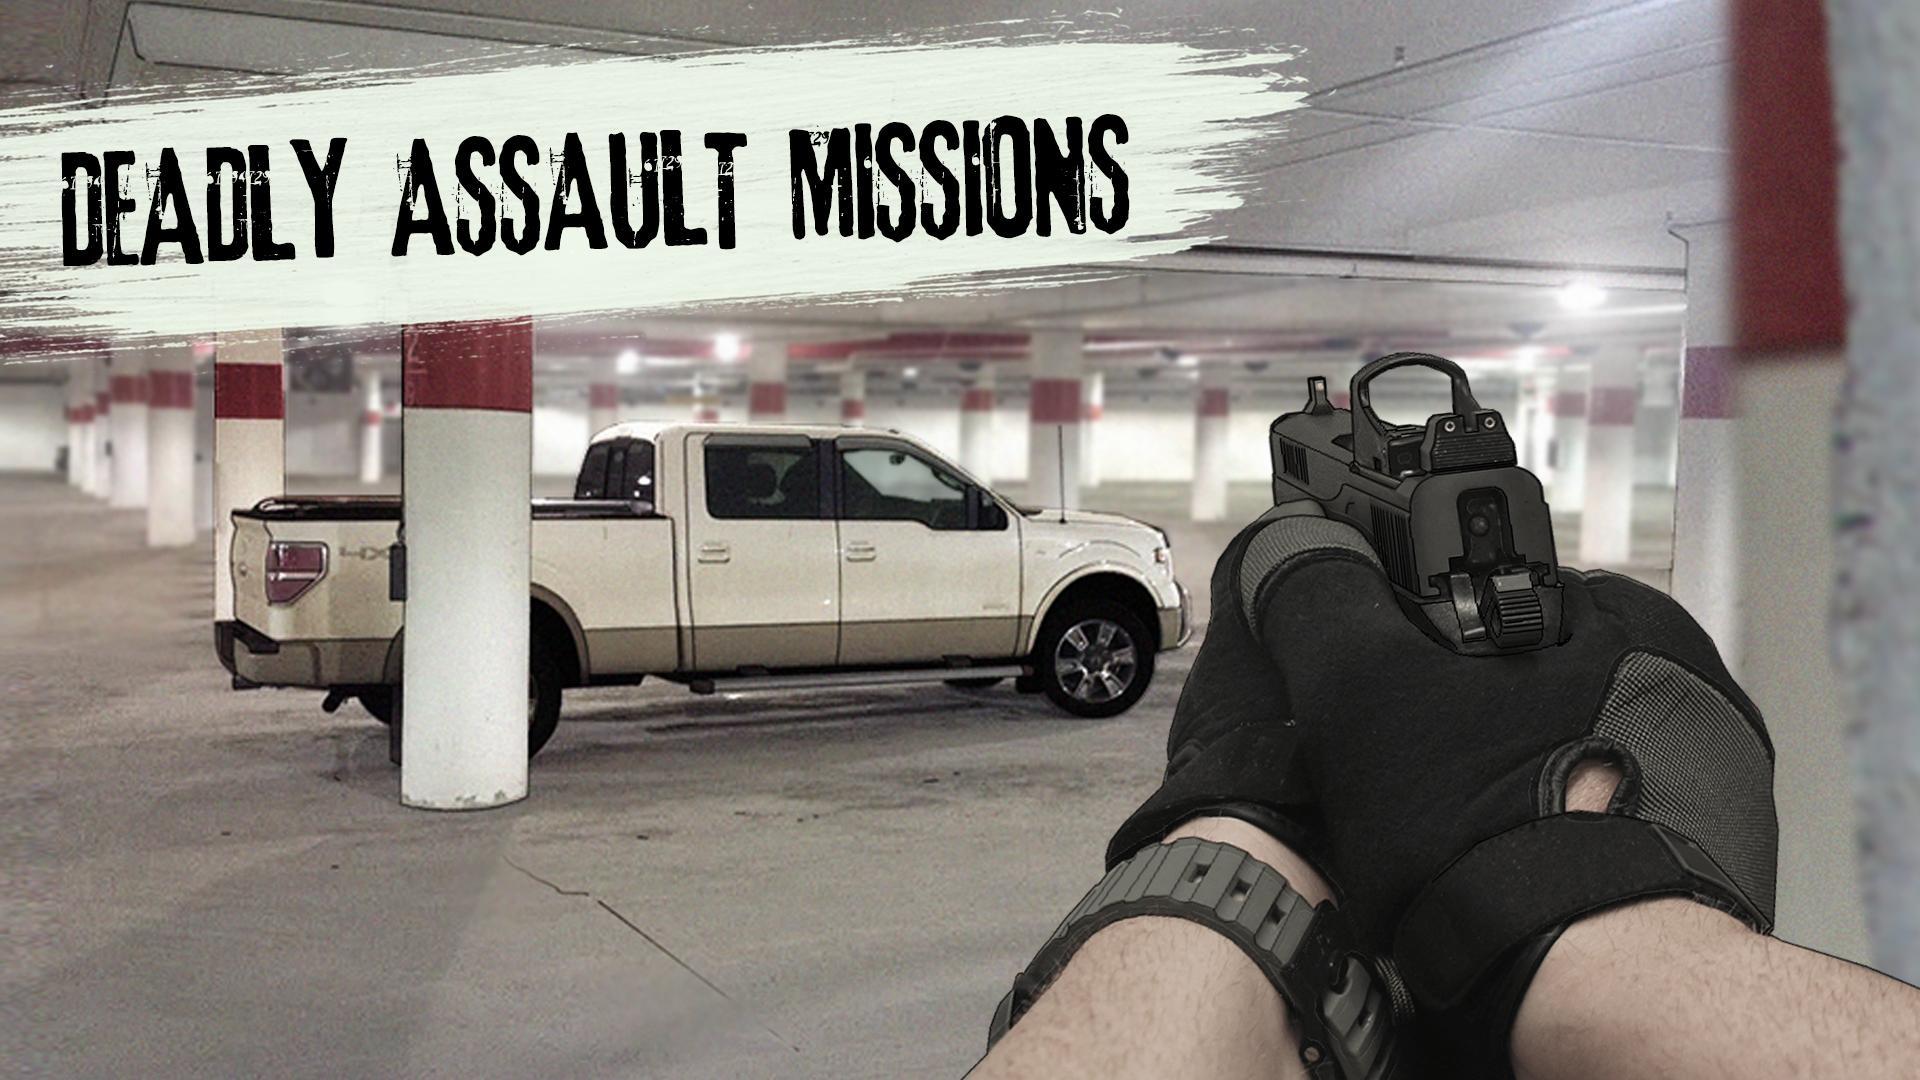 LONEWOLF (17+) - a Sniper Story 1.2.95 Screenshot 5